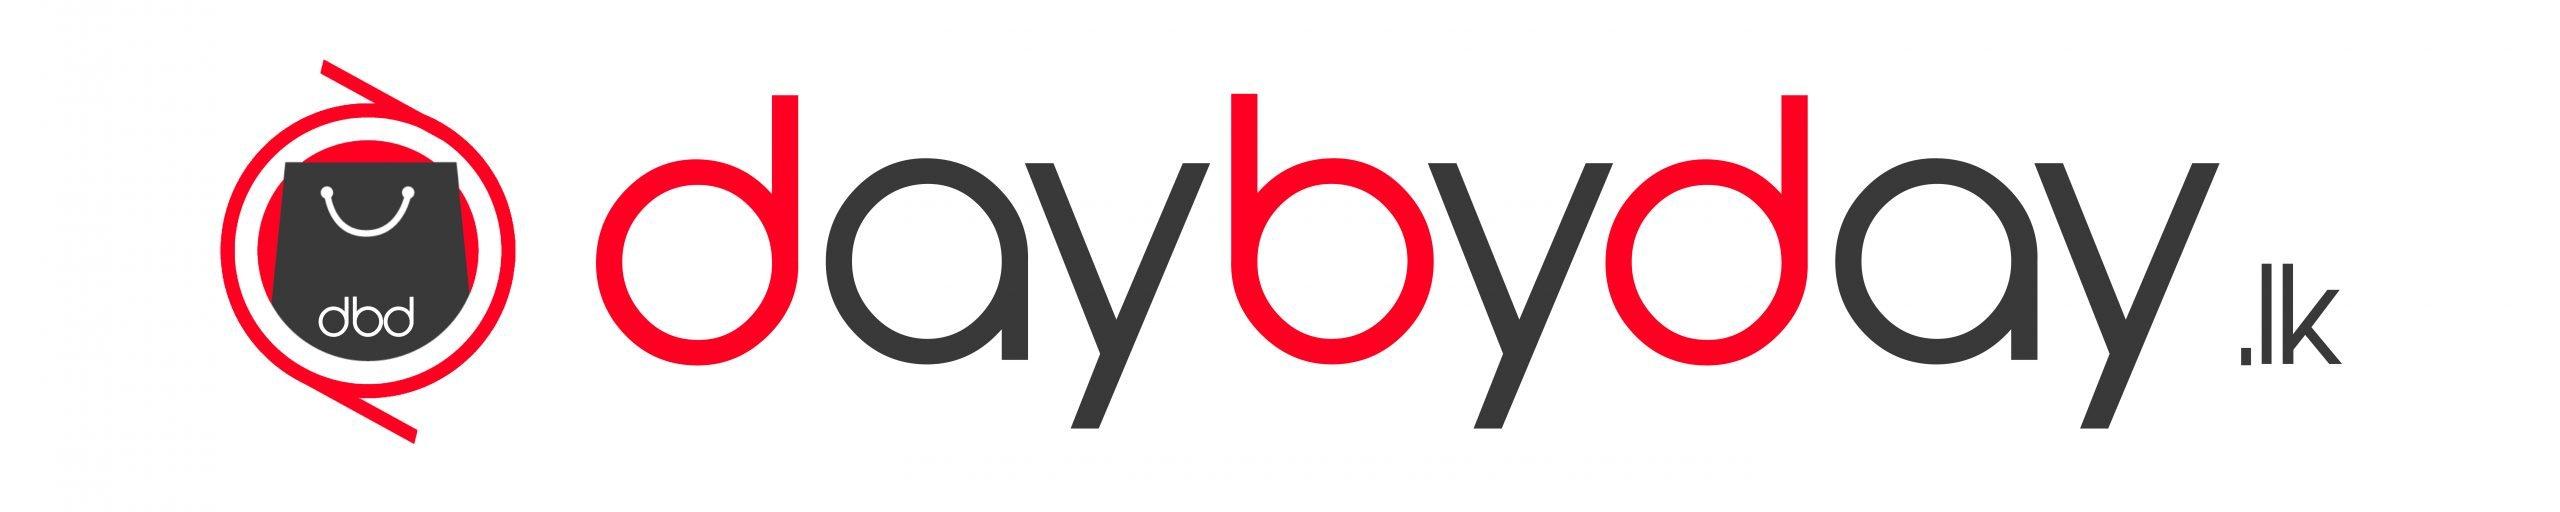 Daybyday.lk